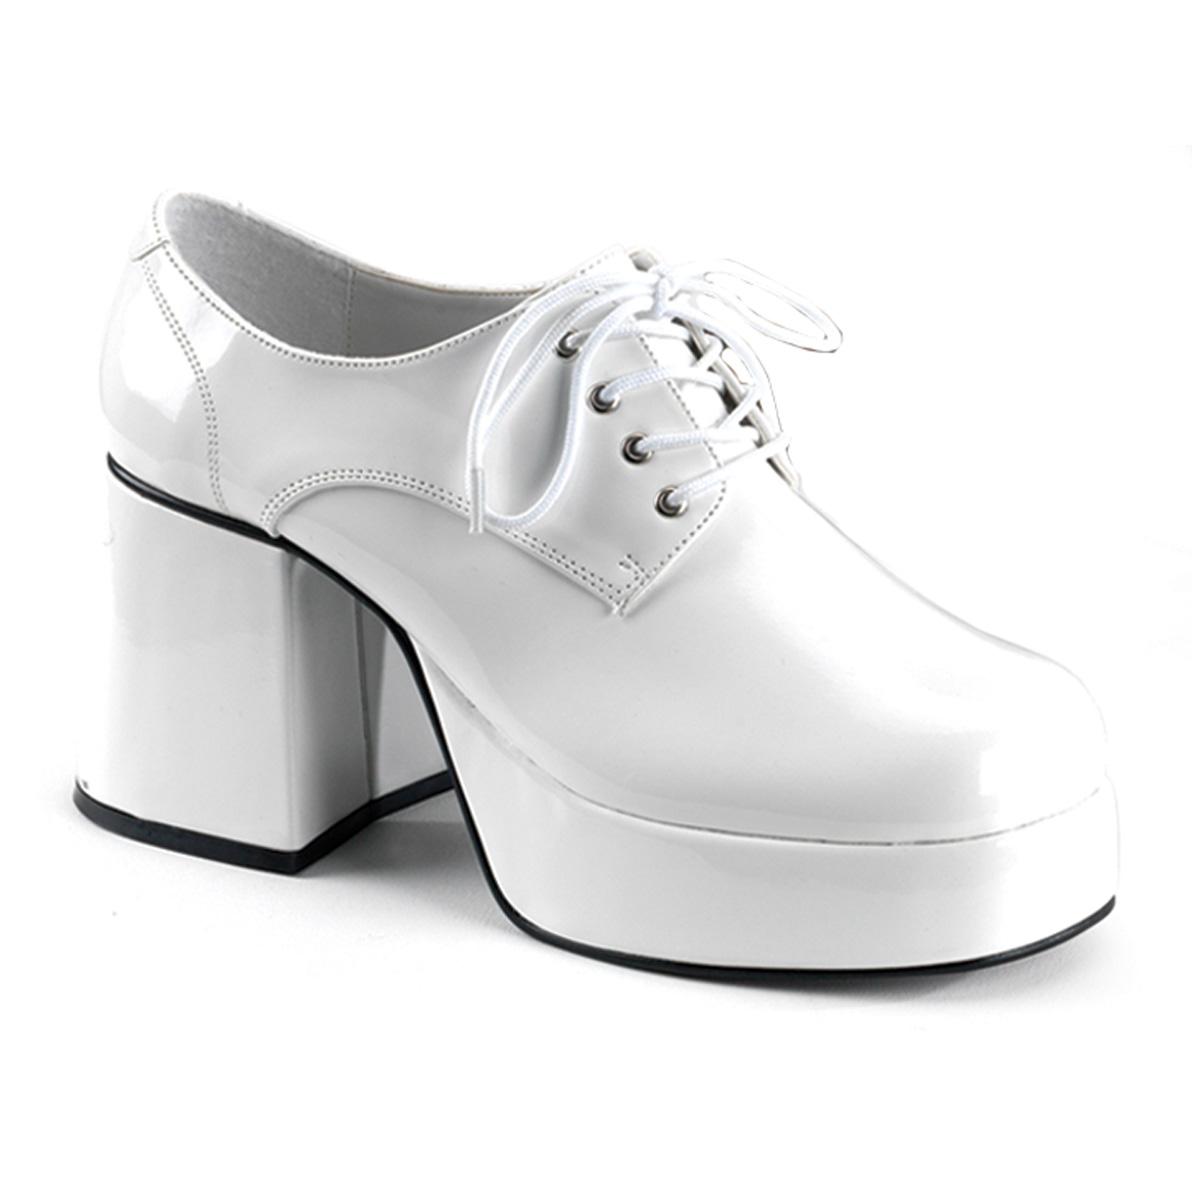 FUNTASMA Heel Jazz-02 Series 3 1/2